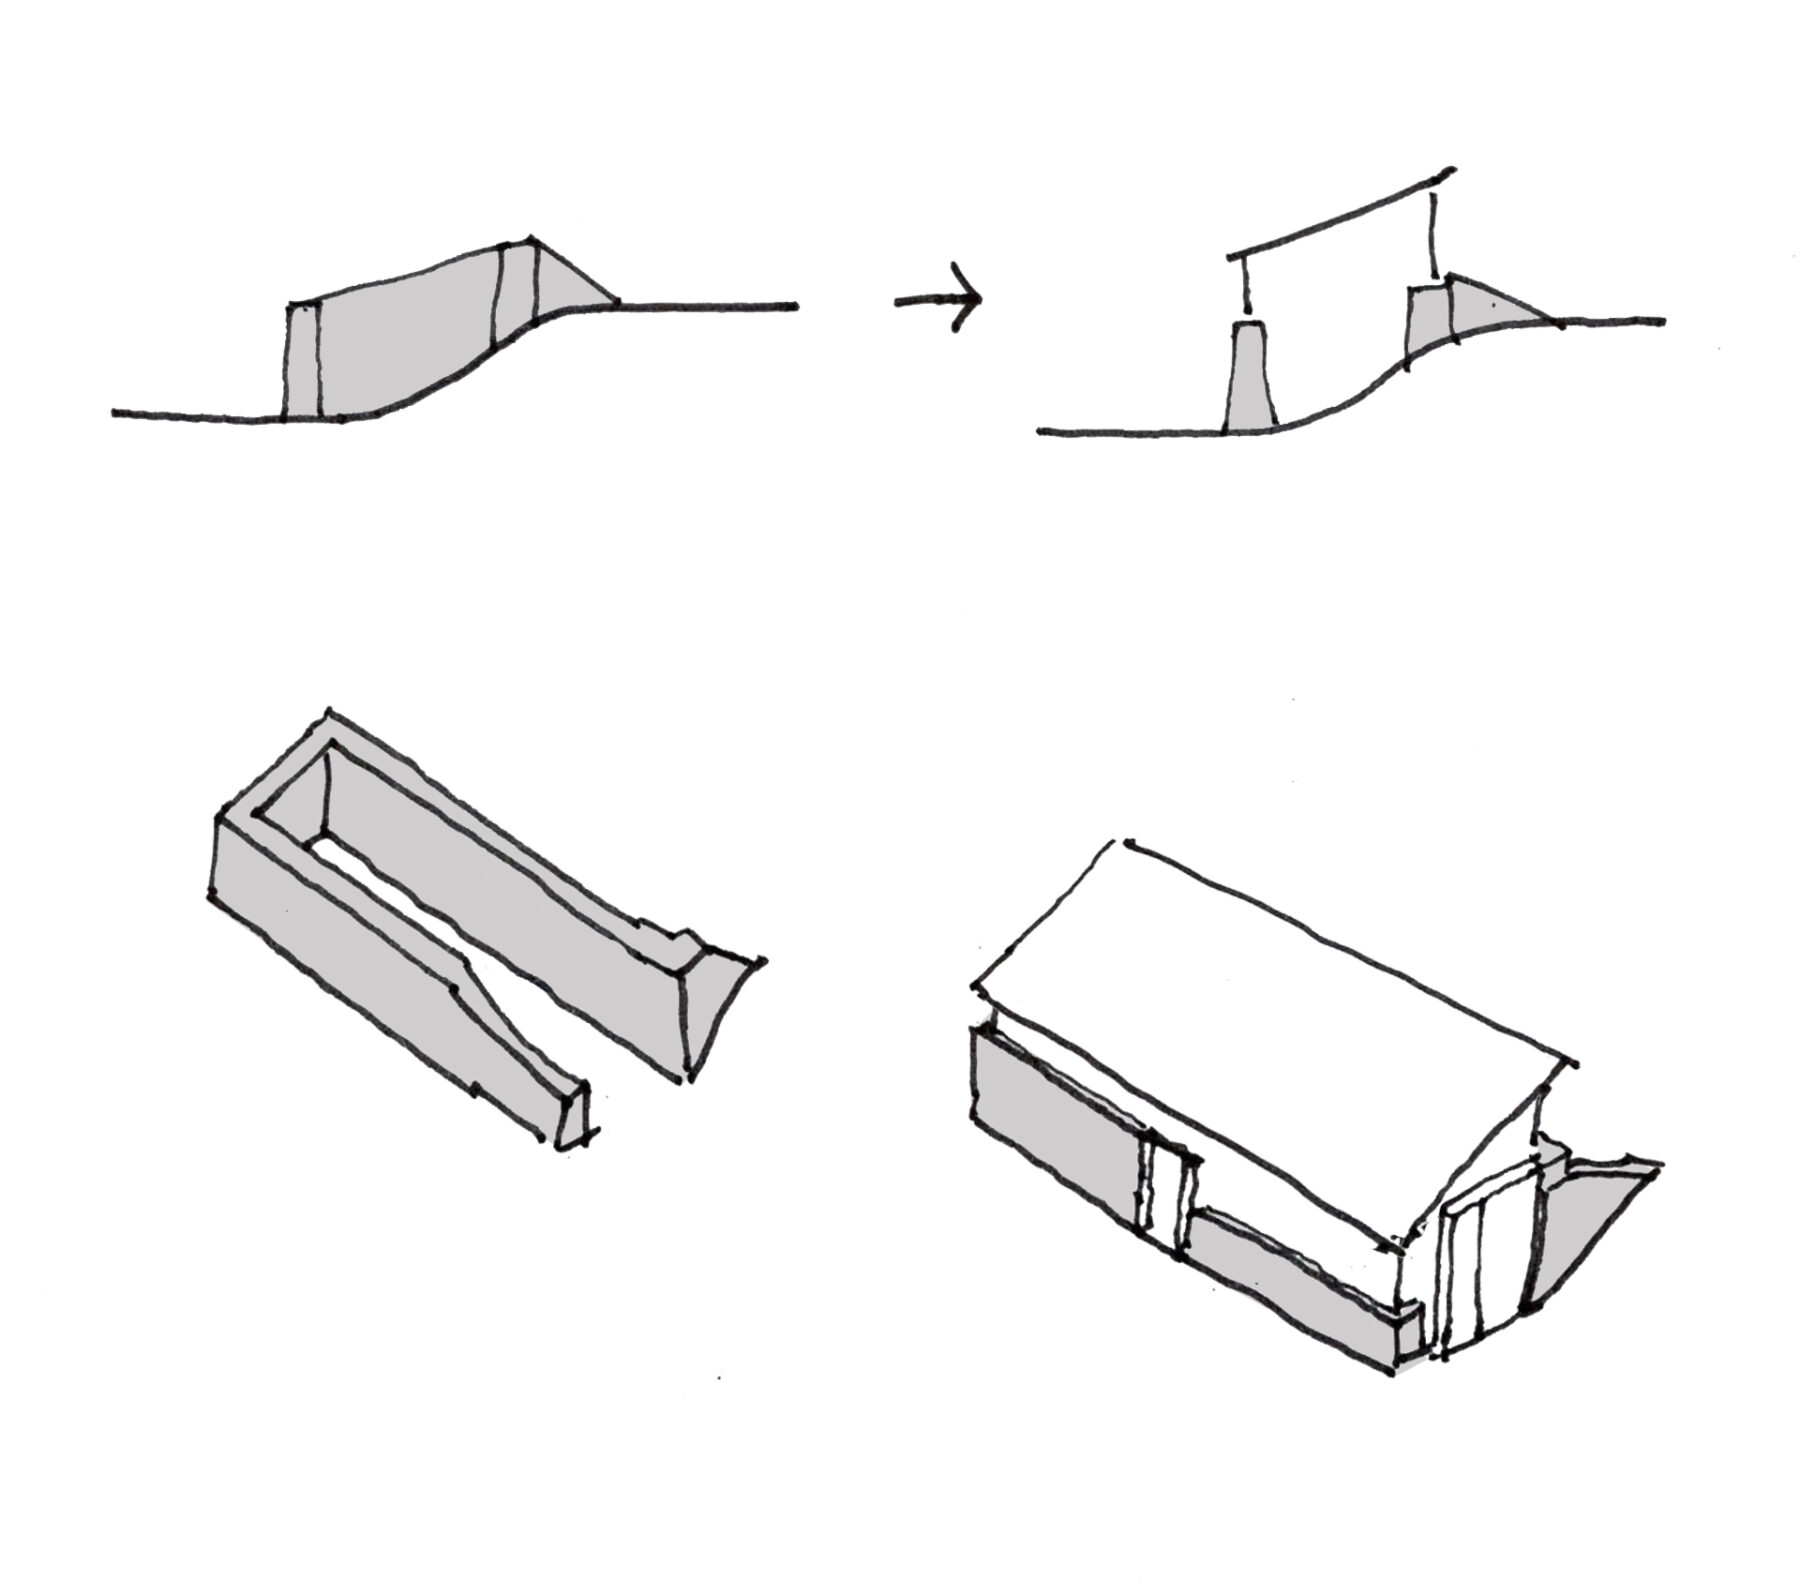 pwll clai barn restoration conservation adaptation